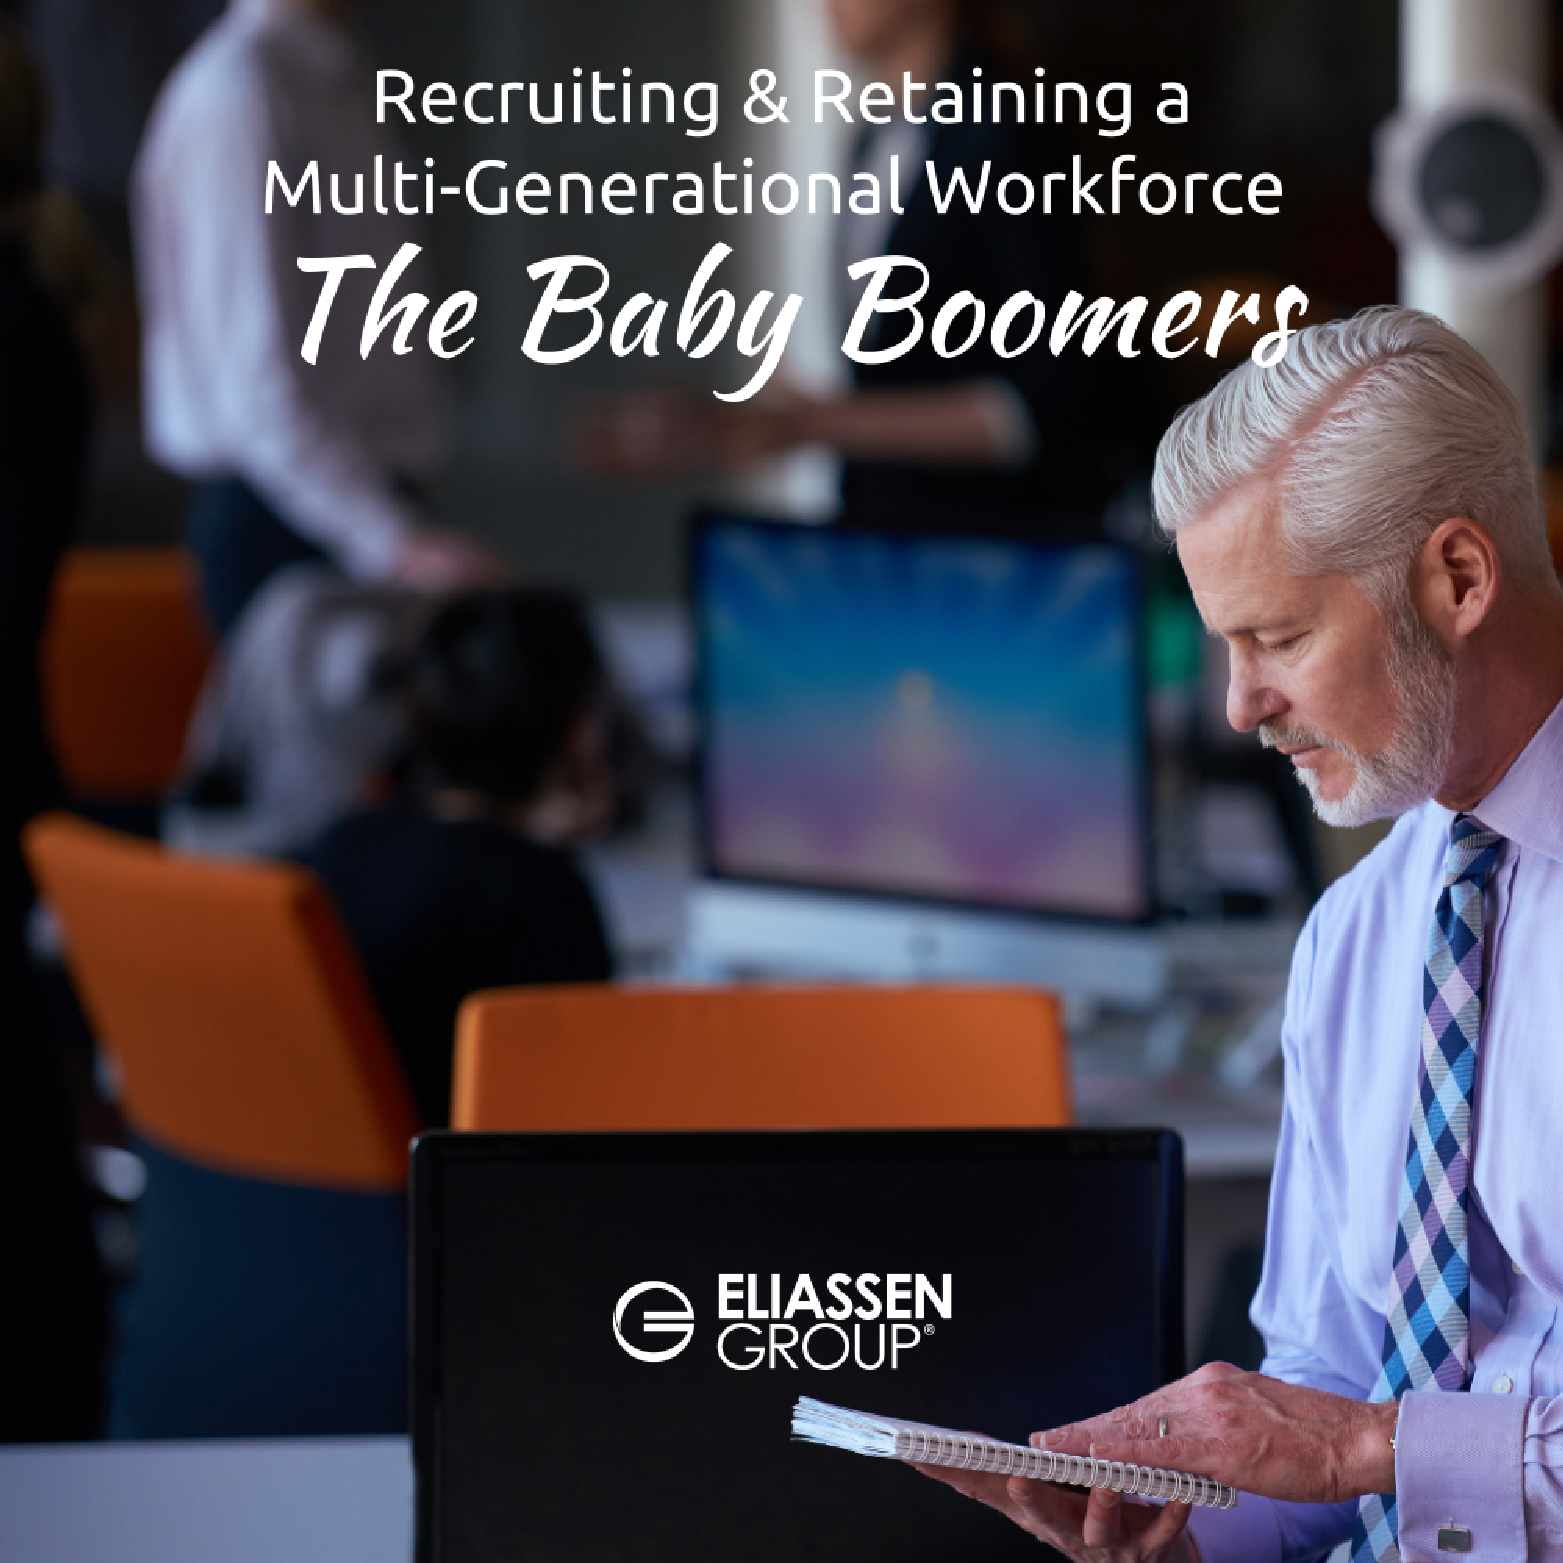 #EliassenGroup #Recruiting #BabyBoomers.png